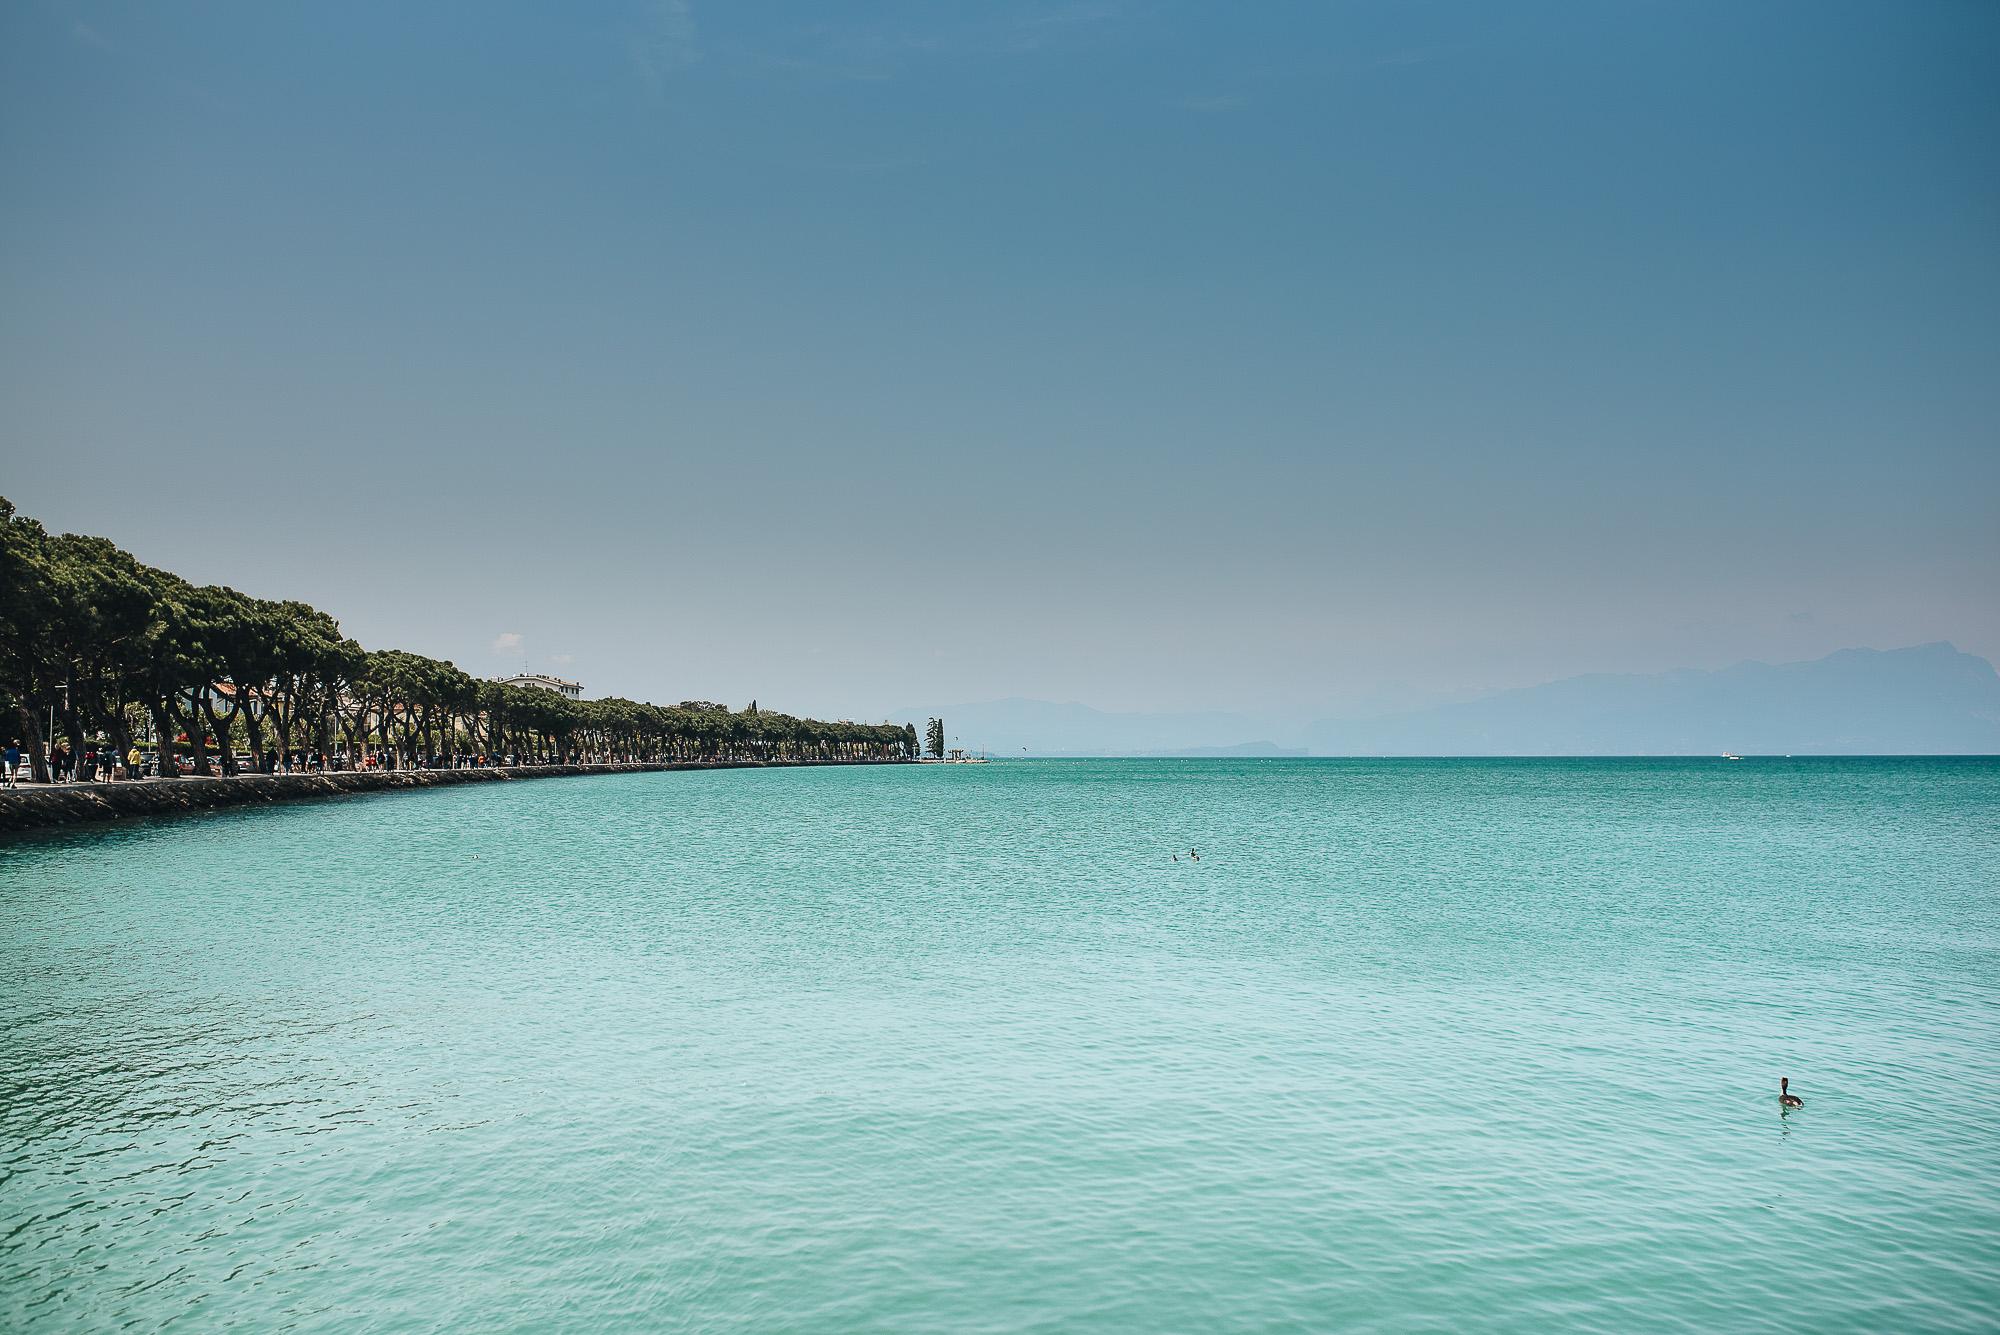 OurBeautifulAdventure-LakeGarda-Italy-Blog-0524.jpg